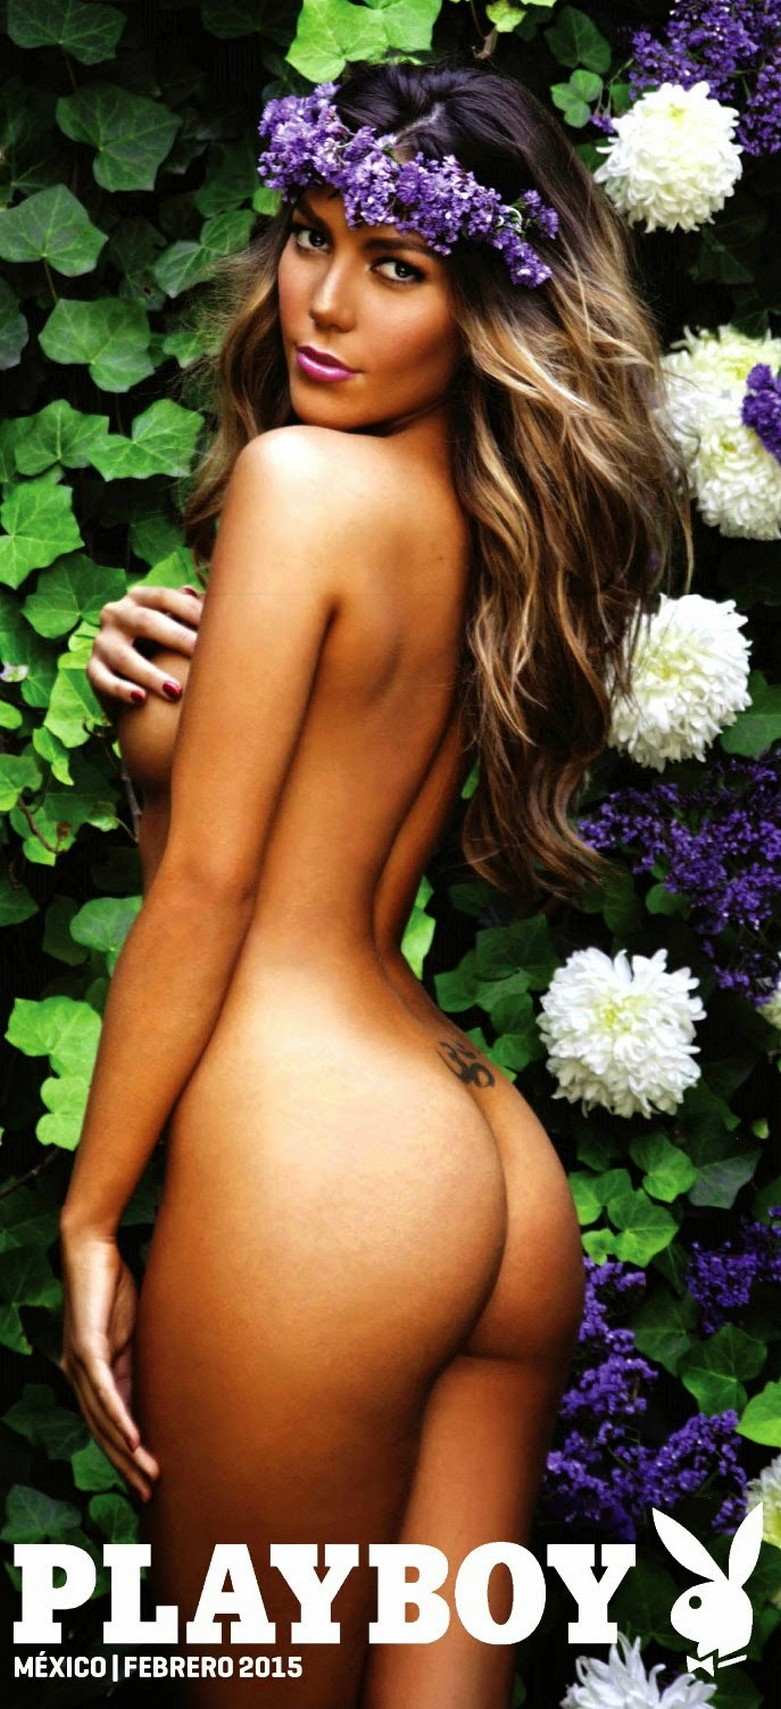 Frida Sofia - Naked Photos in Playboy Mexico! 13